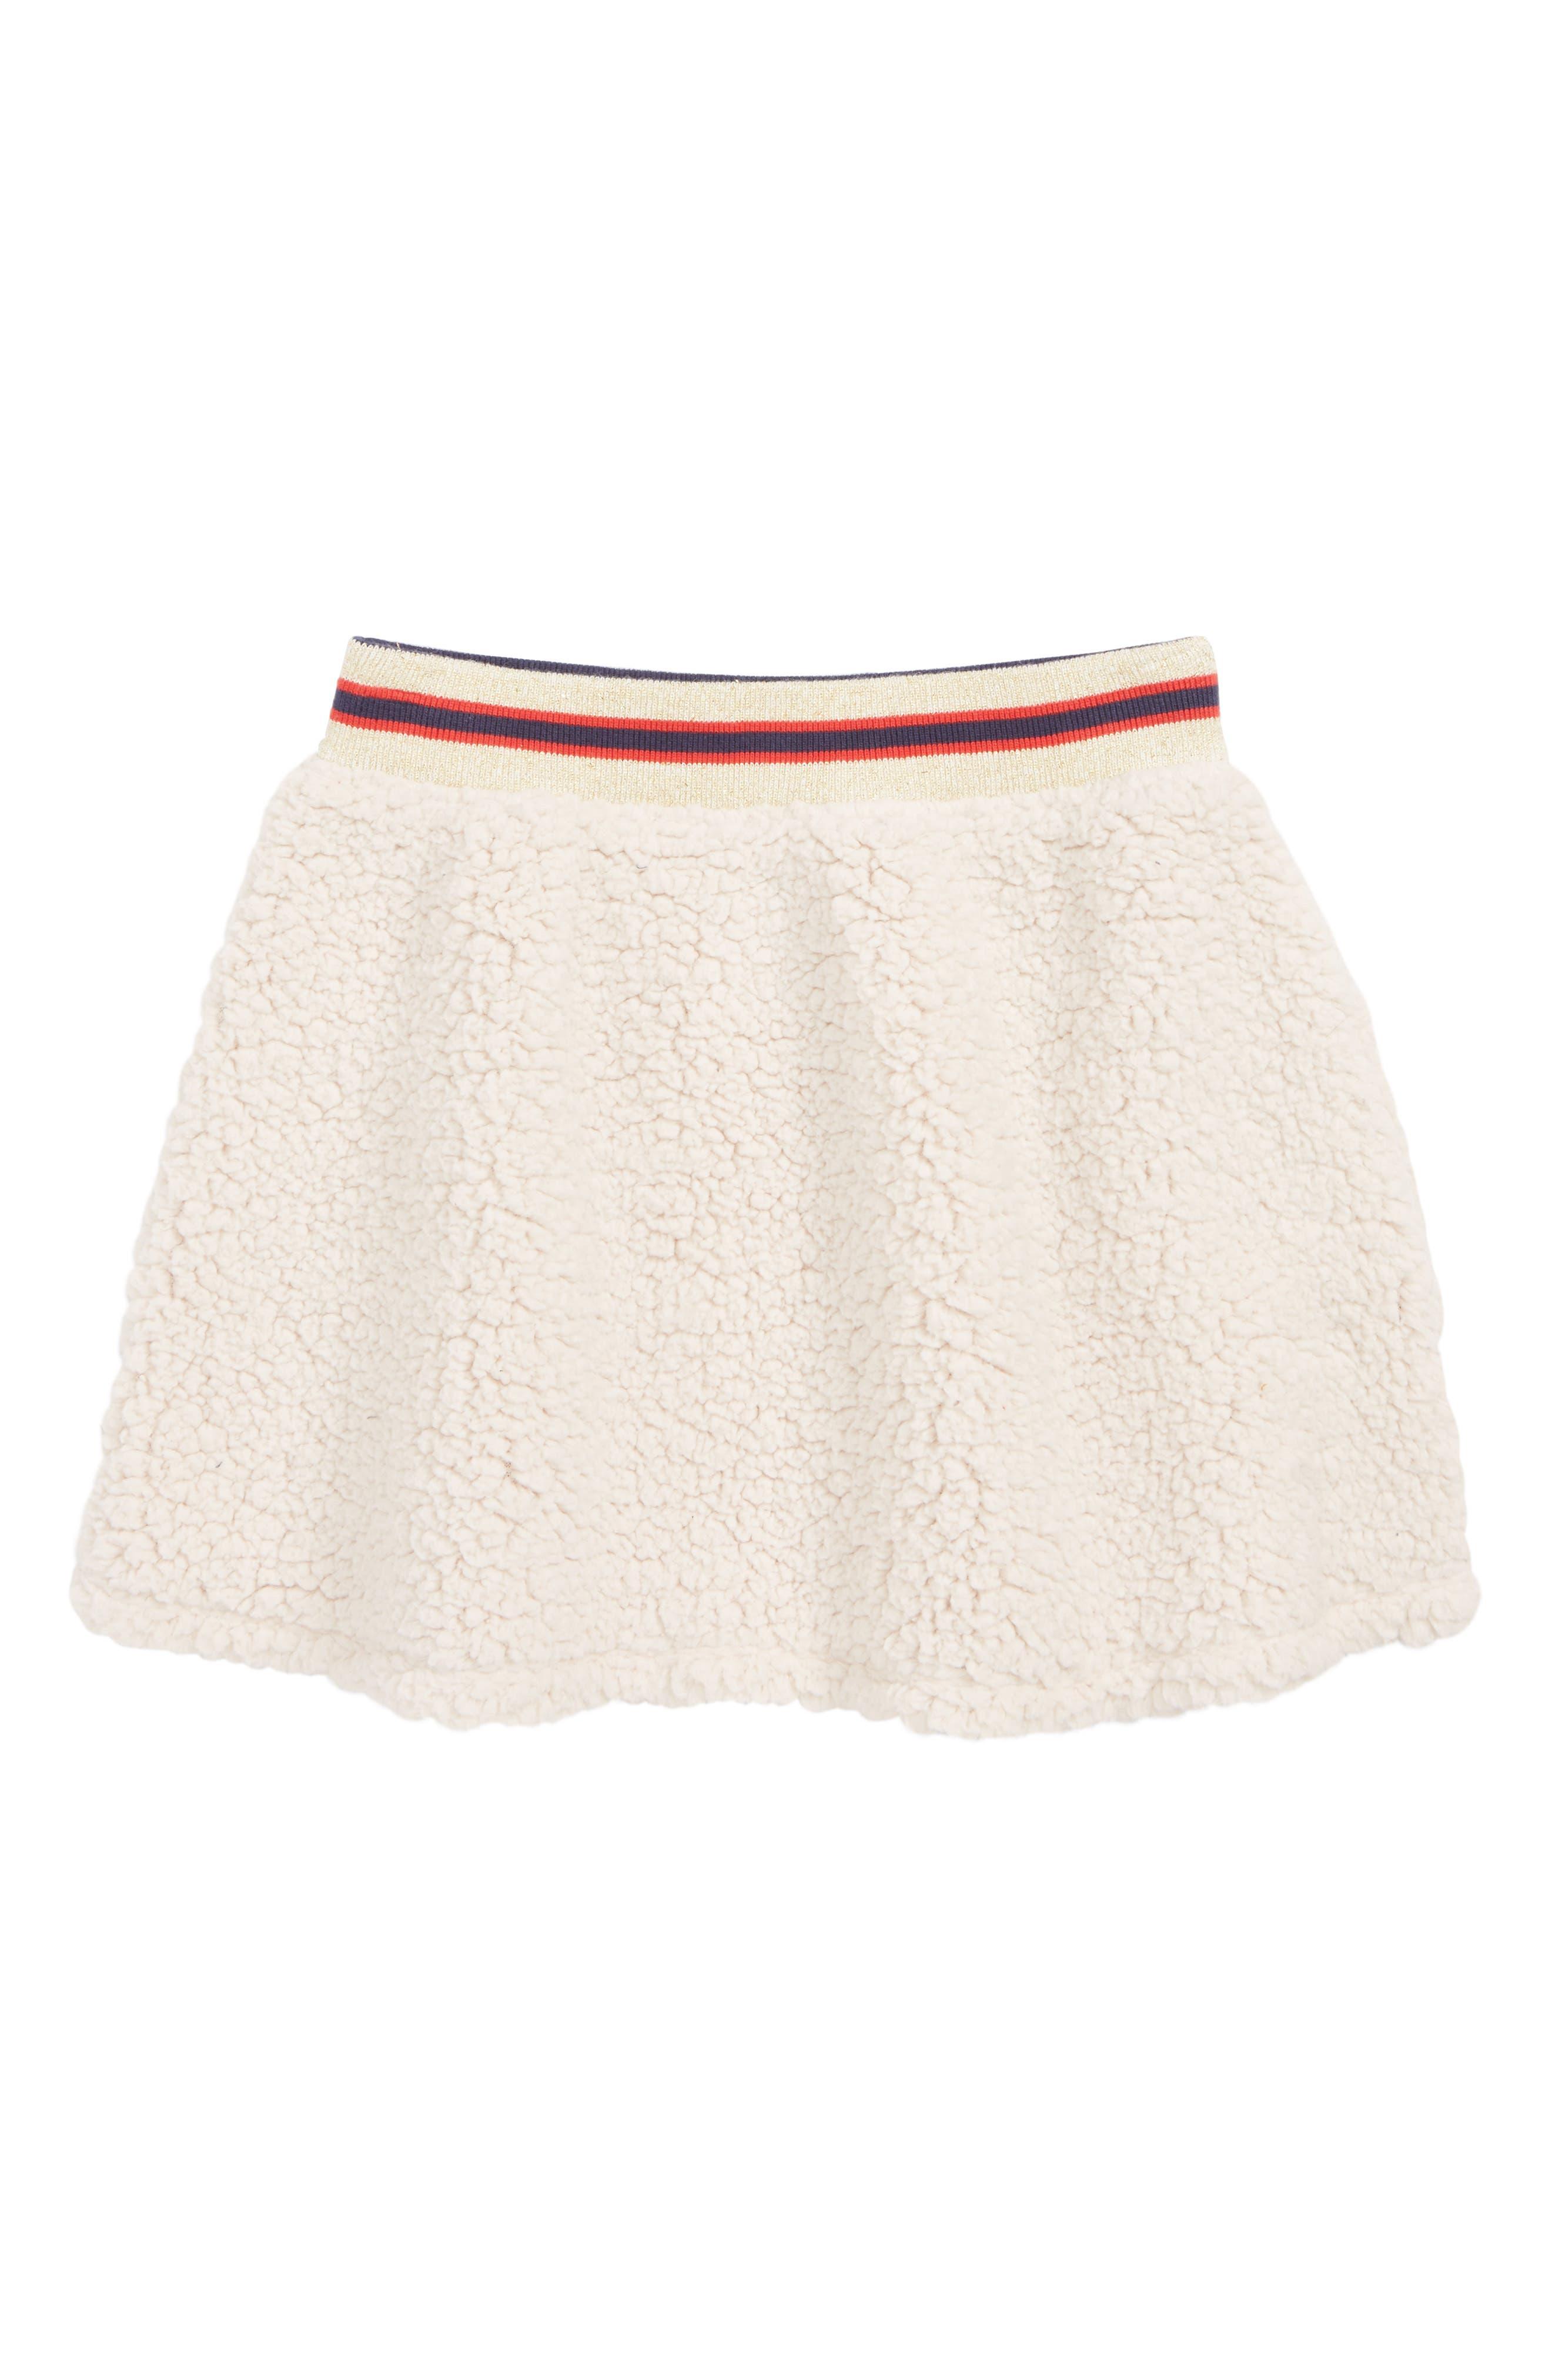 Cozy Cuddle Skirt,                         Main,                         color, IVORY EGRET